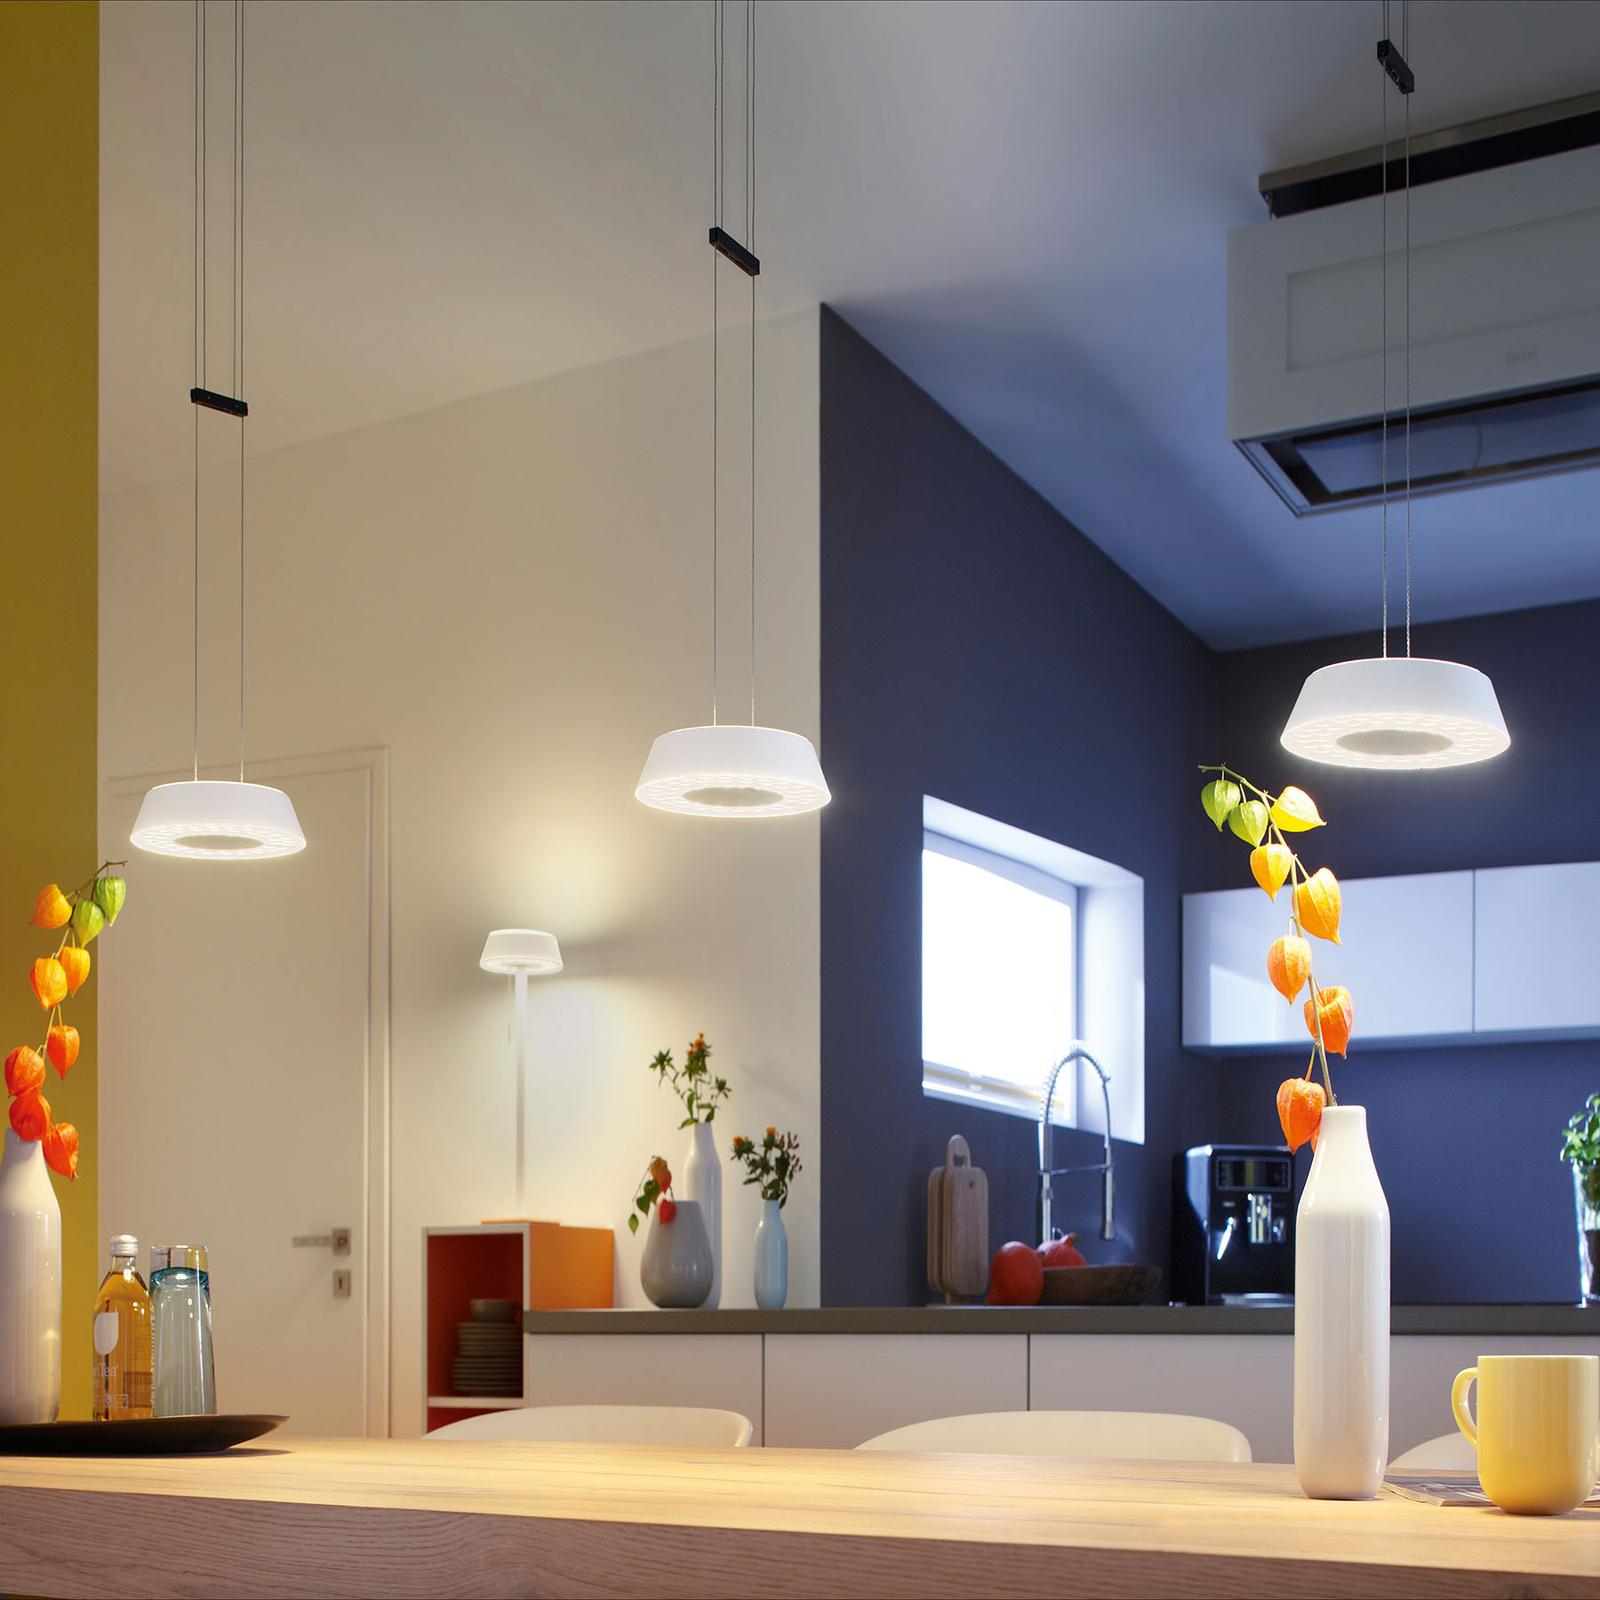 OLIGO Glance LED-riippuvalo 3 lamp., valkoinen